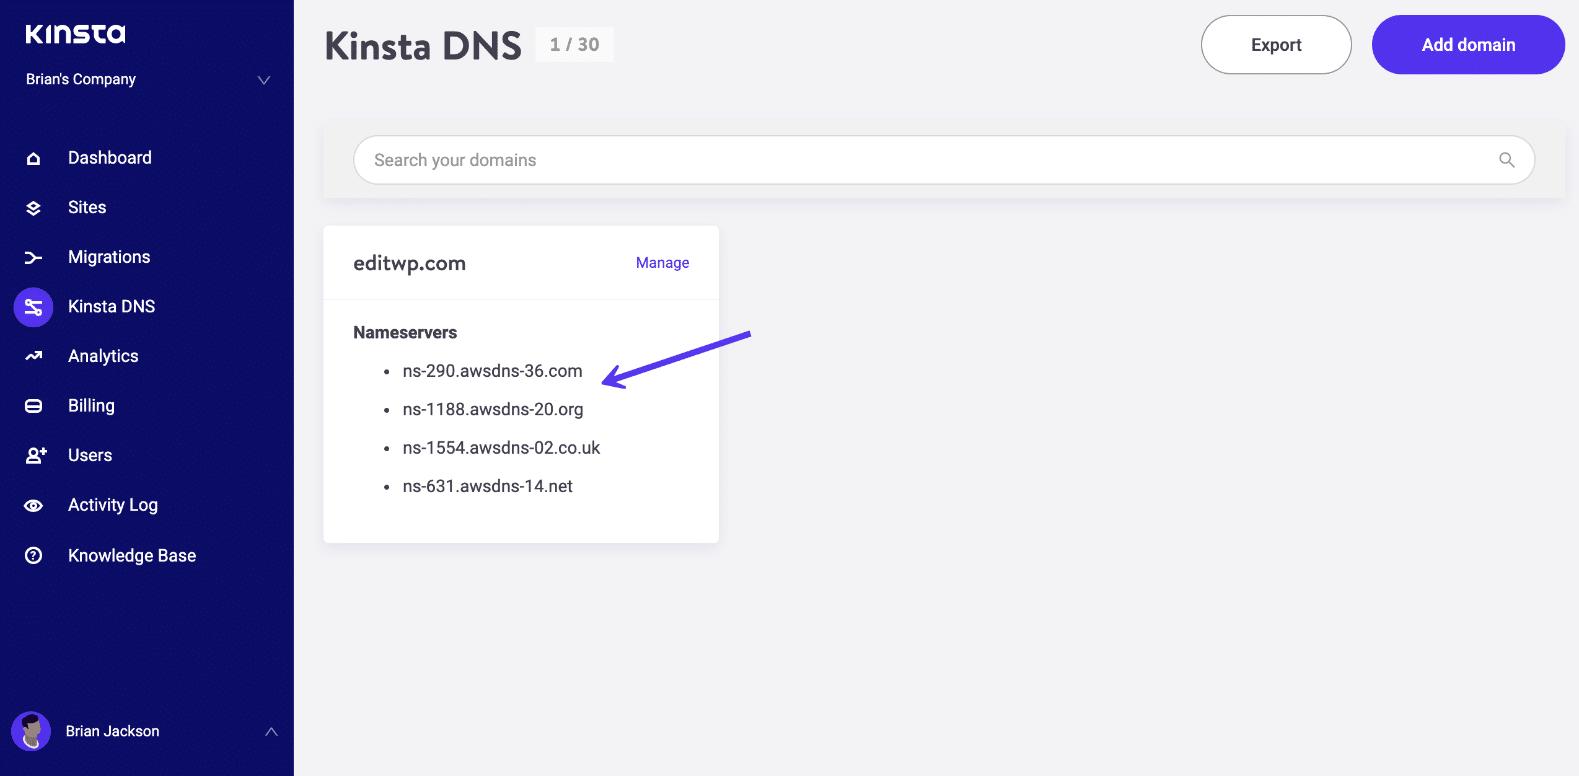 View Kinsta DNS - nameservers